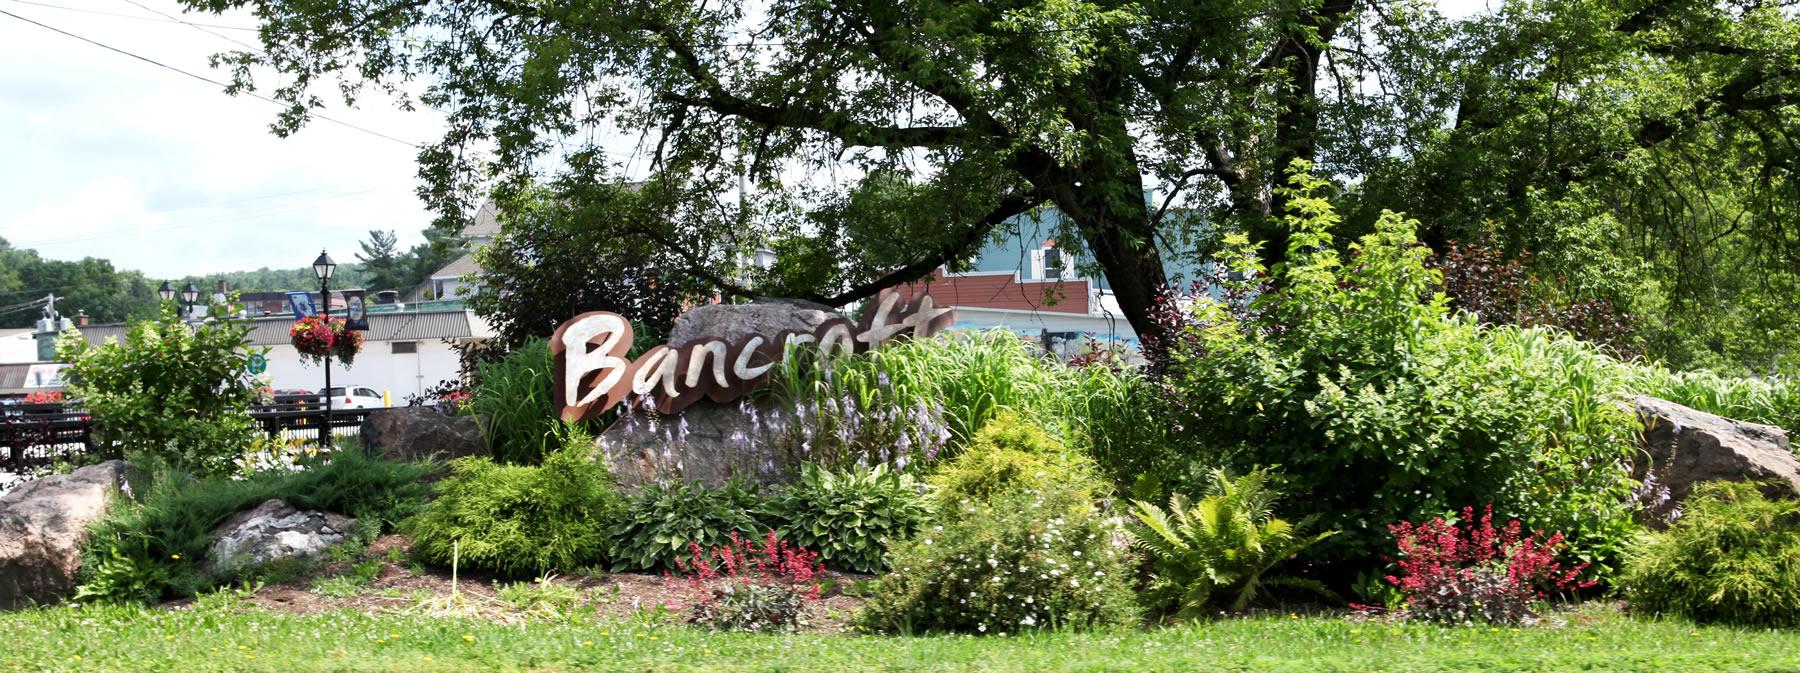 Bancroft Sign